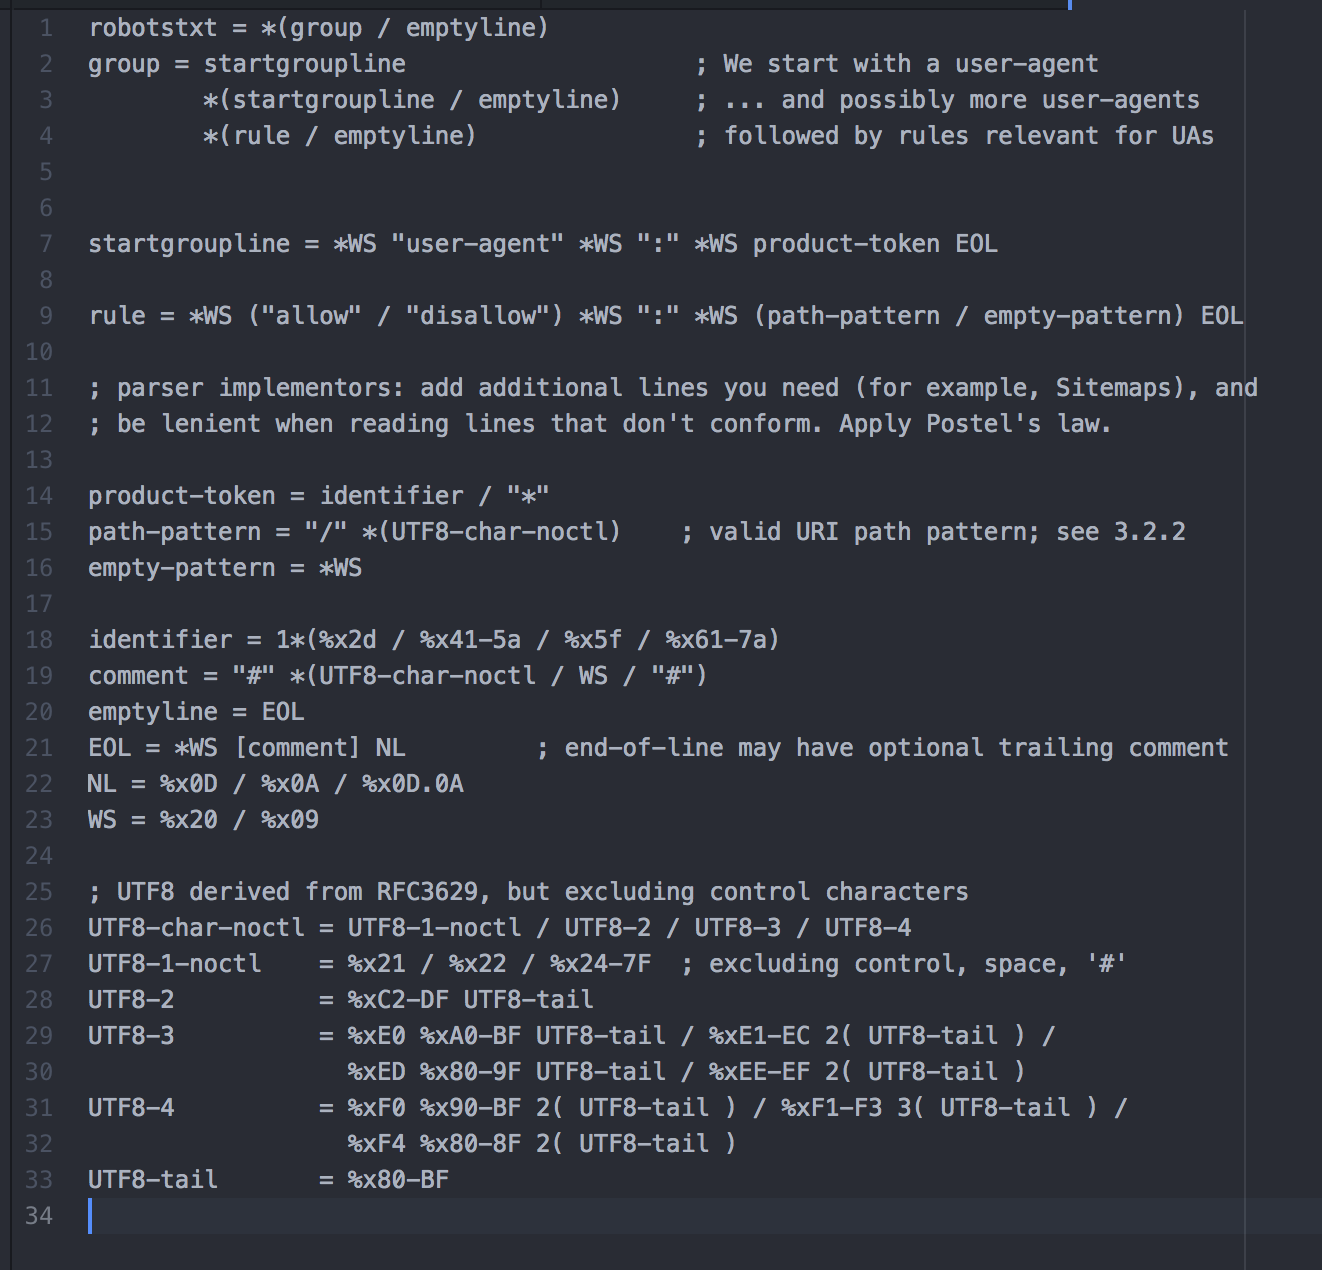 ABNF description of the robots.txt file